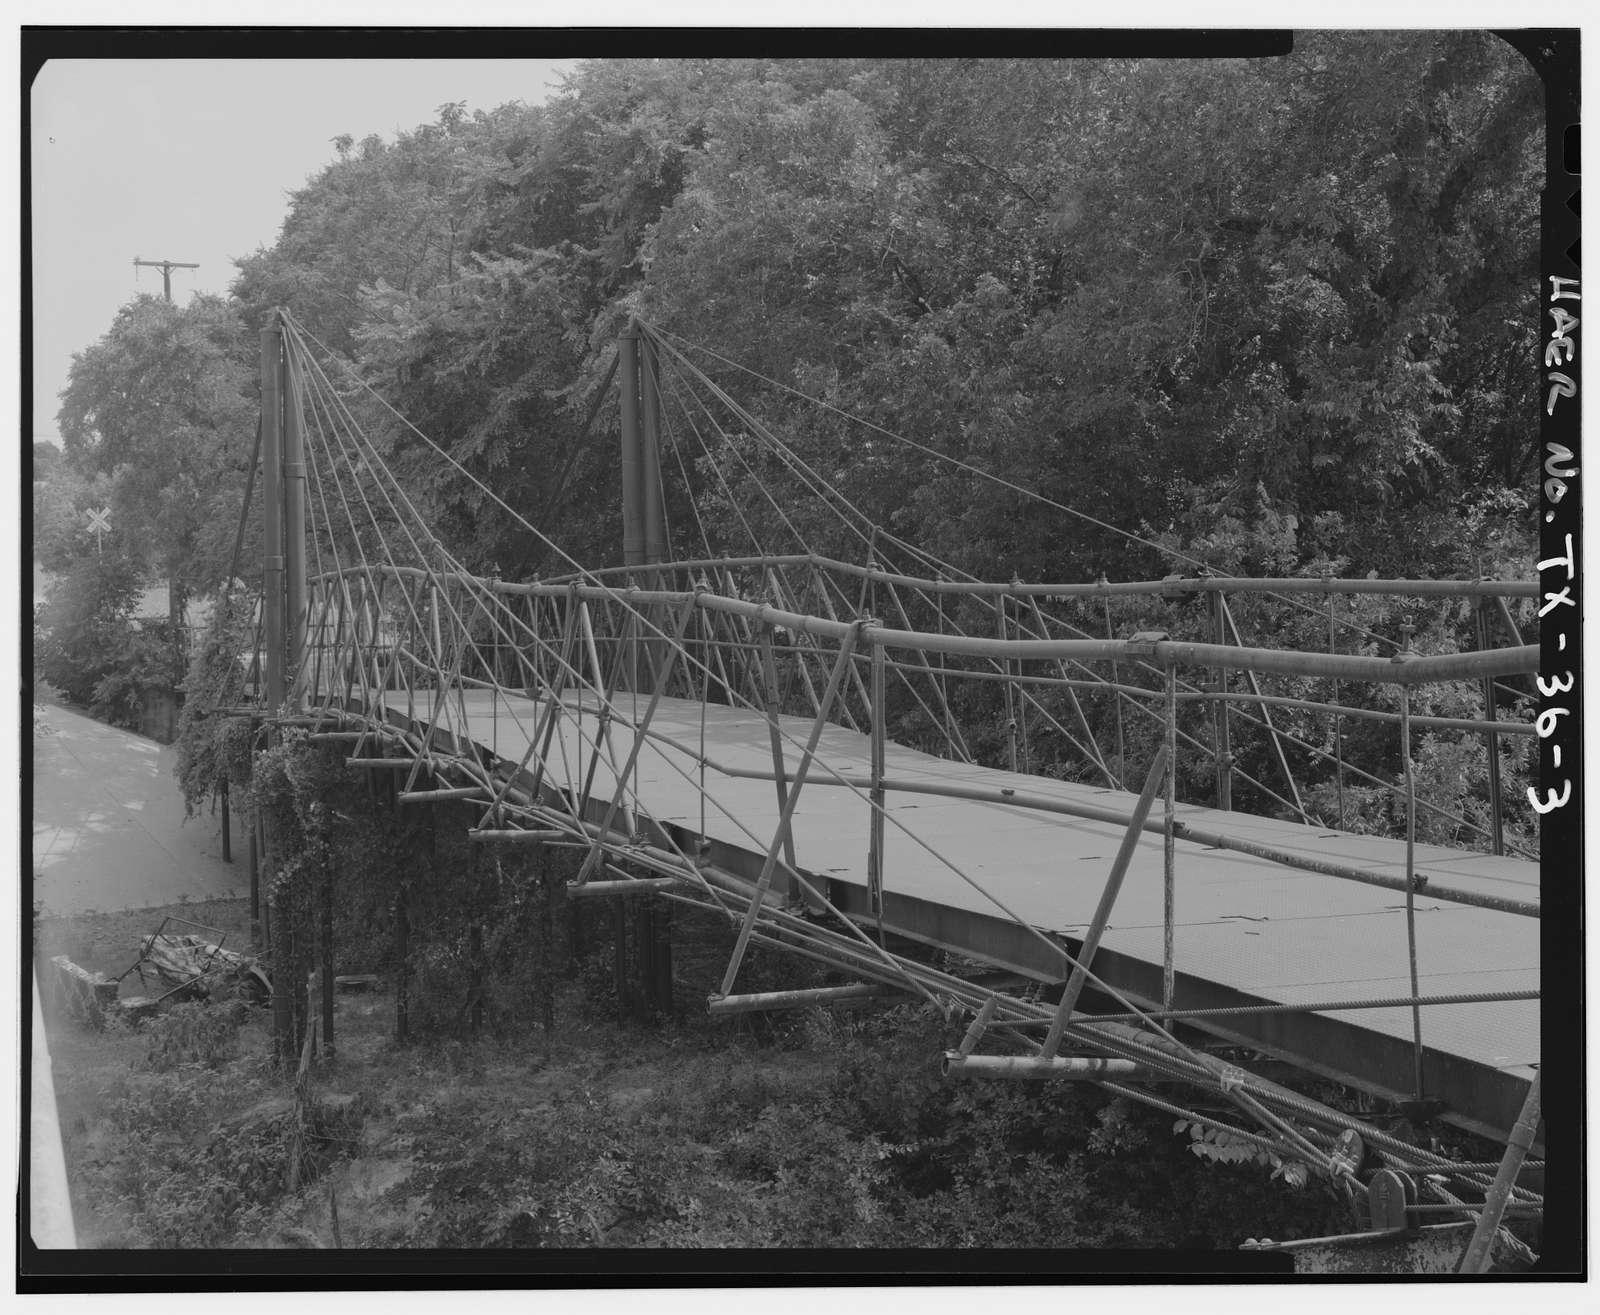 Bluff Dale Suspension Bridge, Spanning Paluxy River at County Route 149, Bluff Dale, Erath County, TX